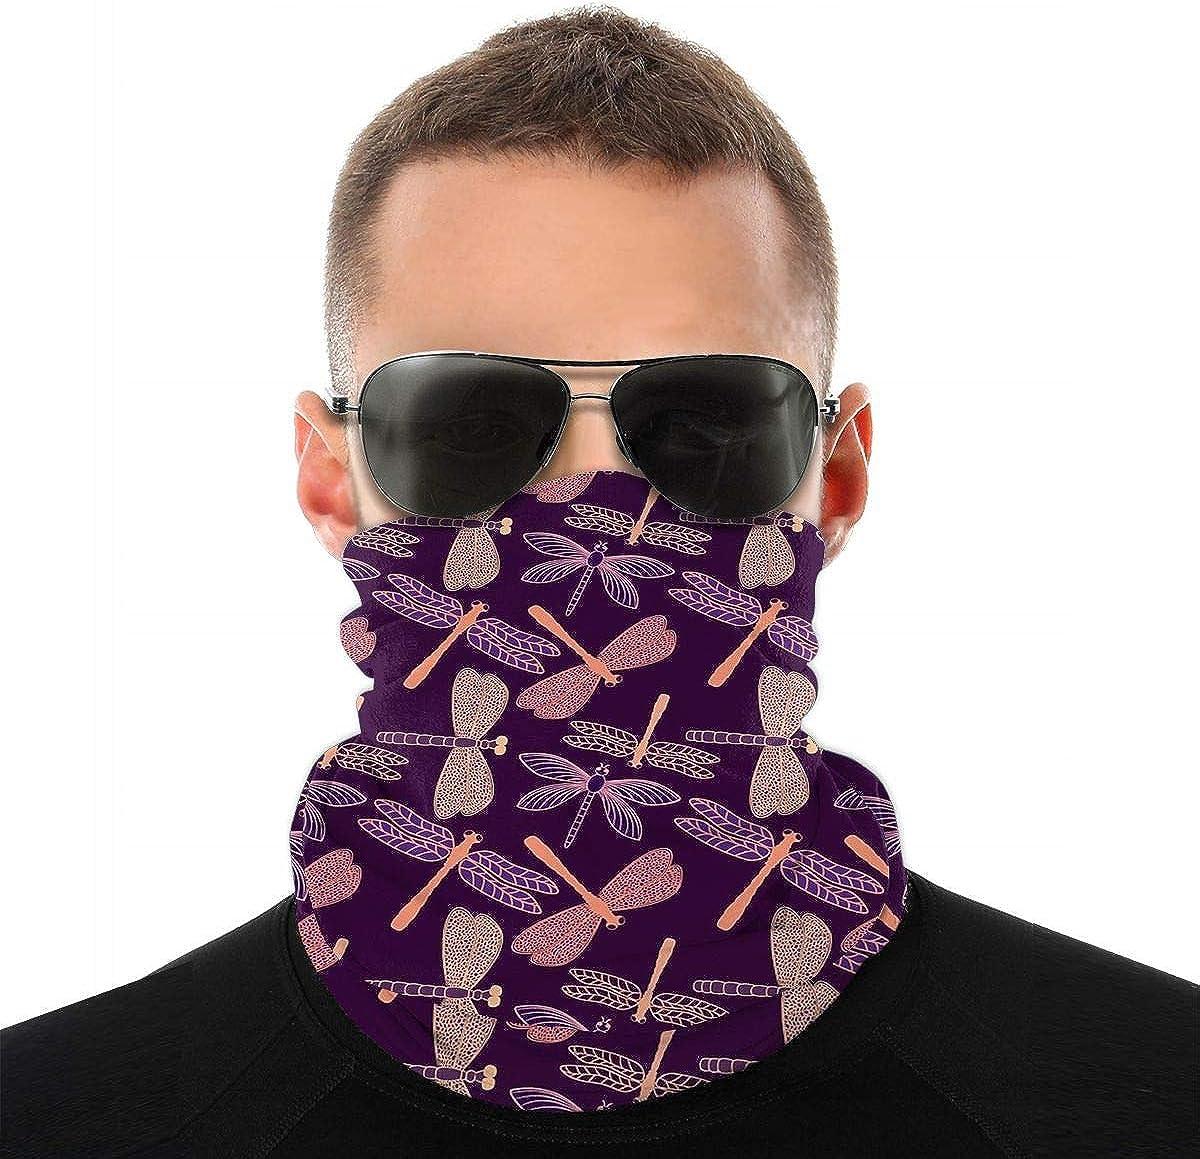 KiuLoam Dragonfly Purple Pattern Seamless Face Mask Bandanas Neck Gaiter for Men and Women, Multifunction Headband Scarf for Dust, Outdoors, Sports